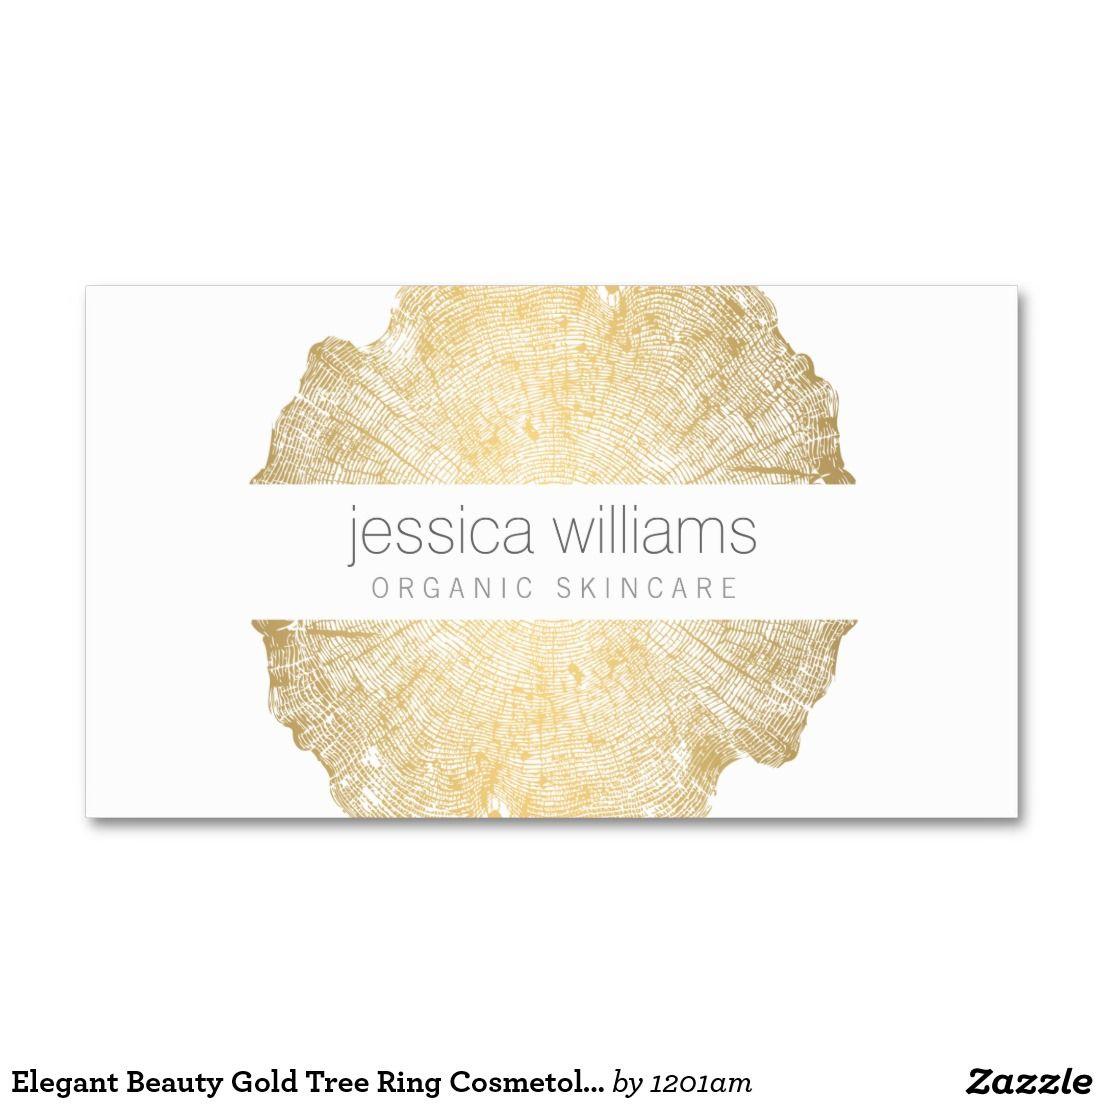 Luxe Wood Effect Art Cosmetologist Business Card | Brand design ...